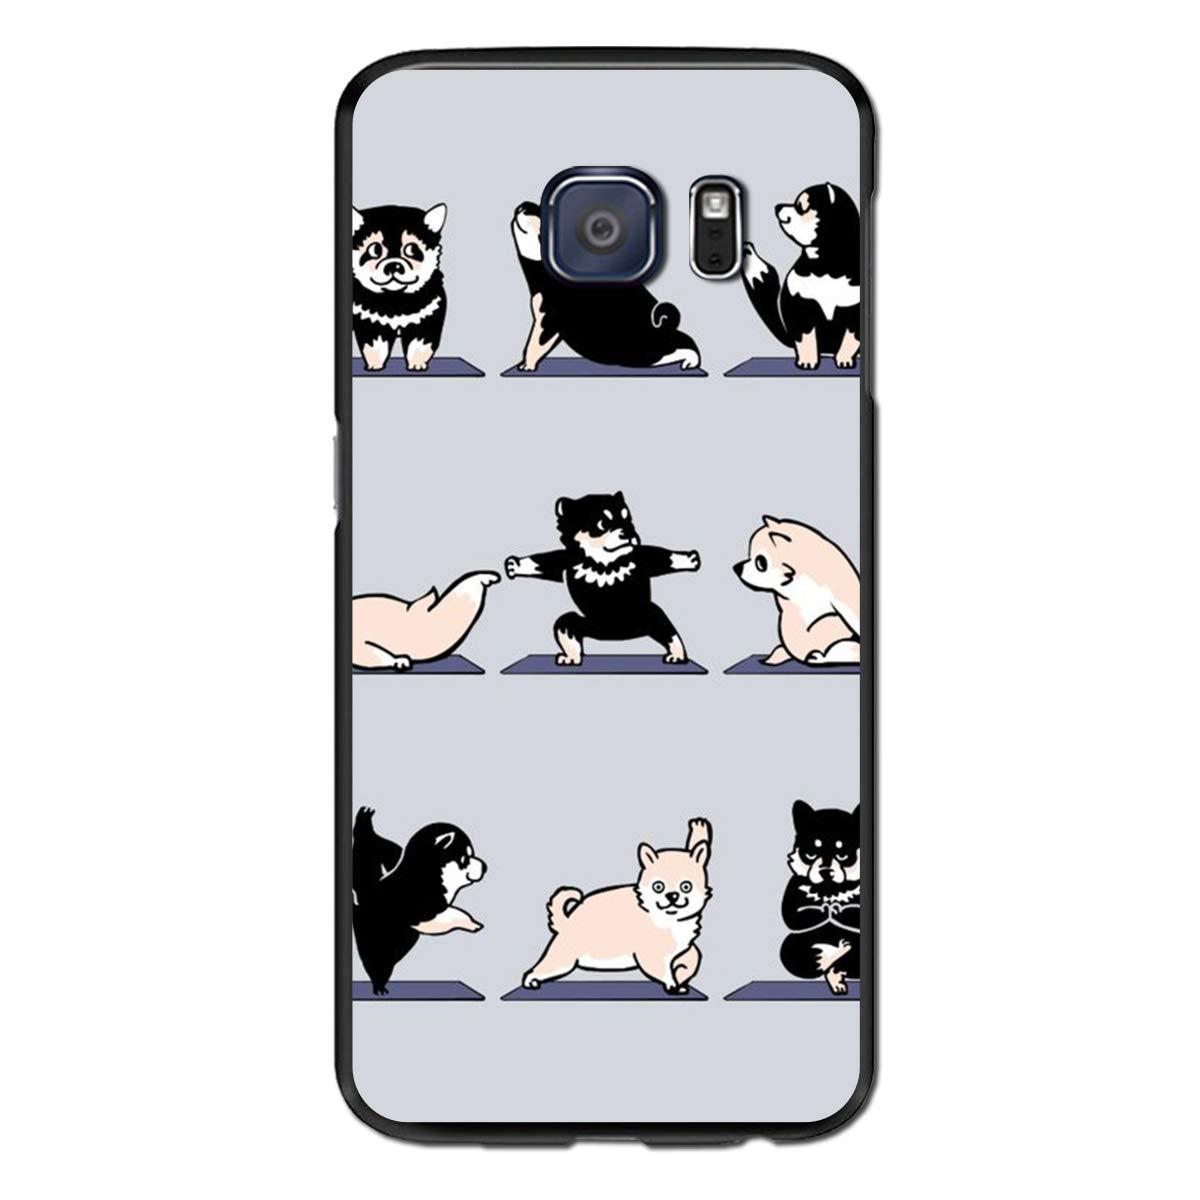 Amazon.com: S6 Edge Case Shiba Yoga - Case for Galaxy S6 ...